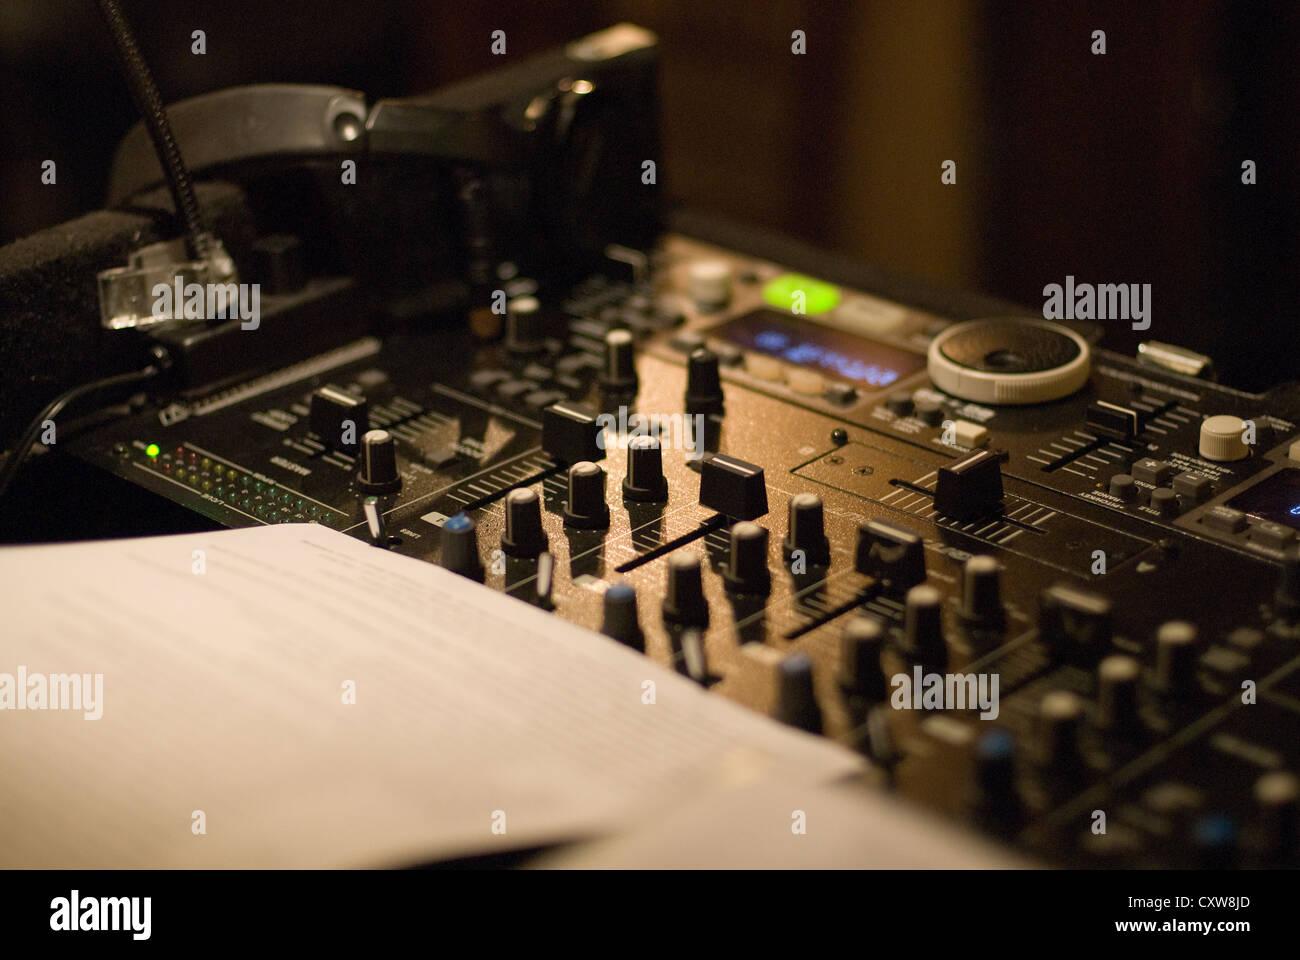 A DJ control panel console controller - Stock Image